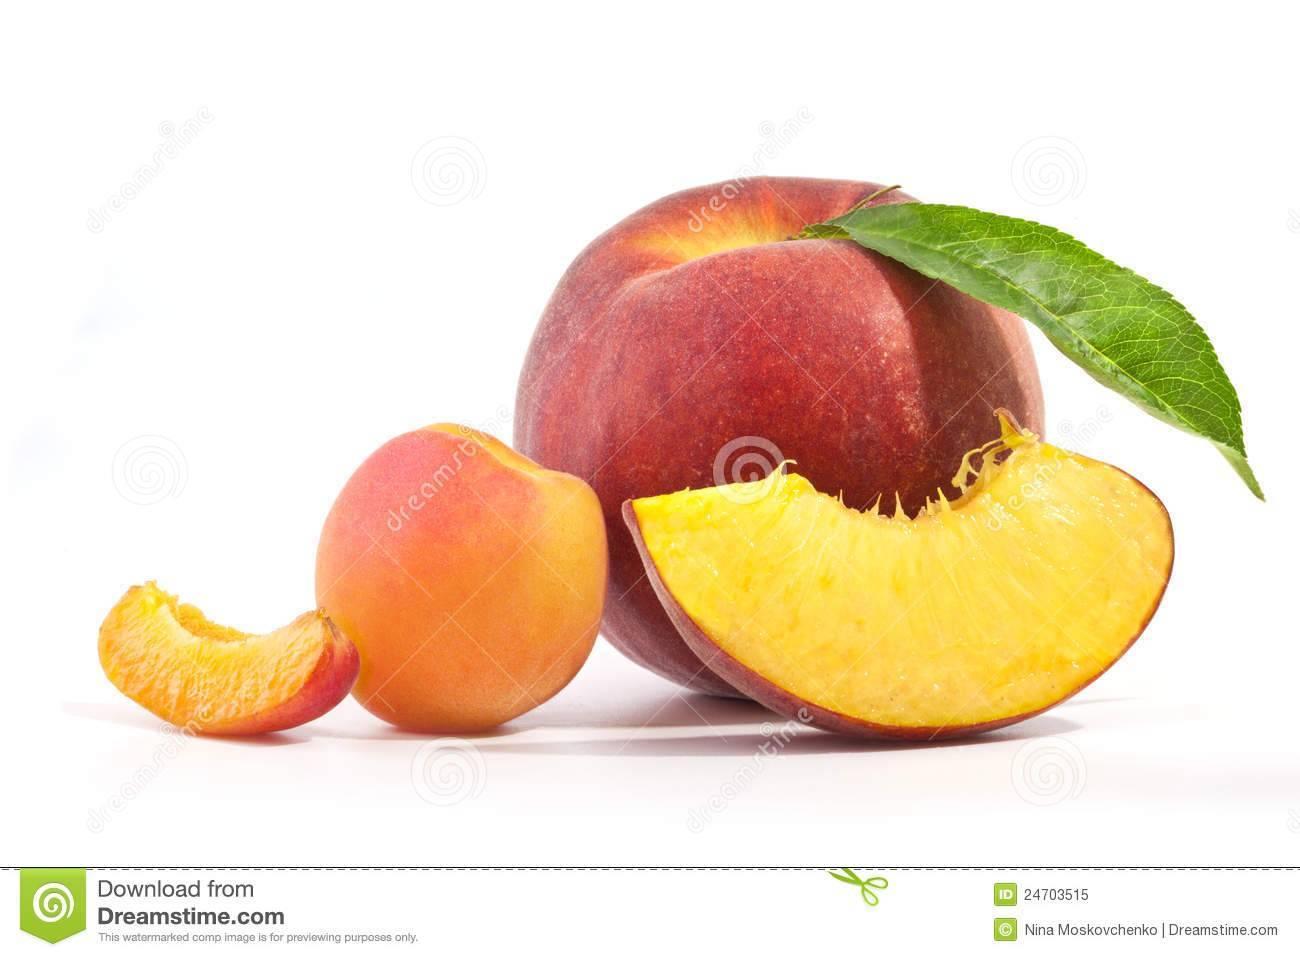 Гибрид персика и абрикоса: причины популярности